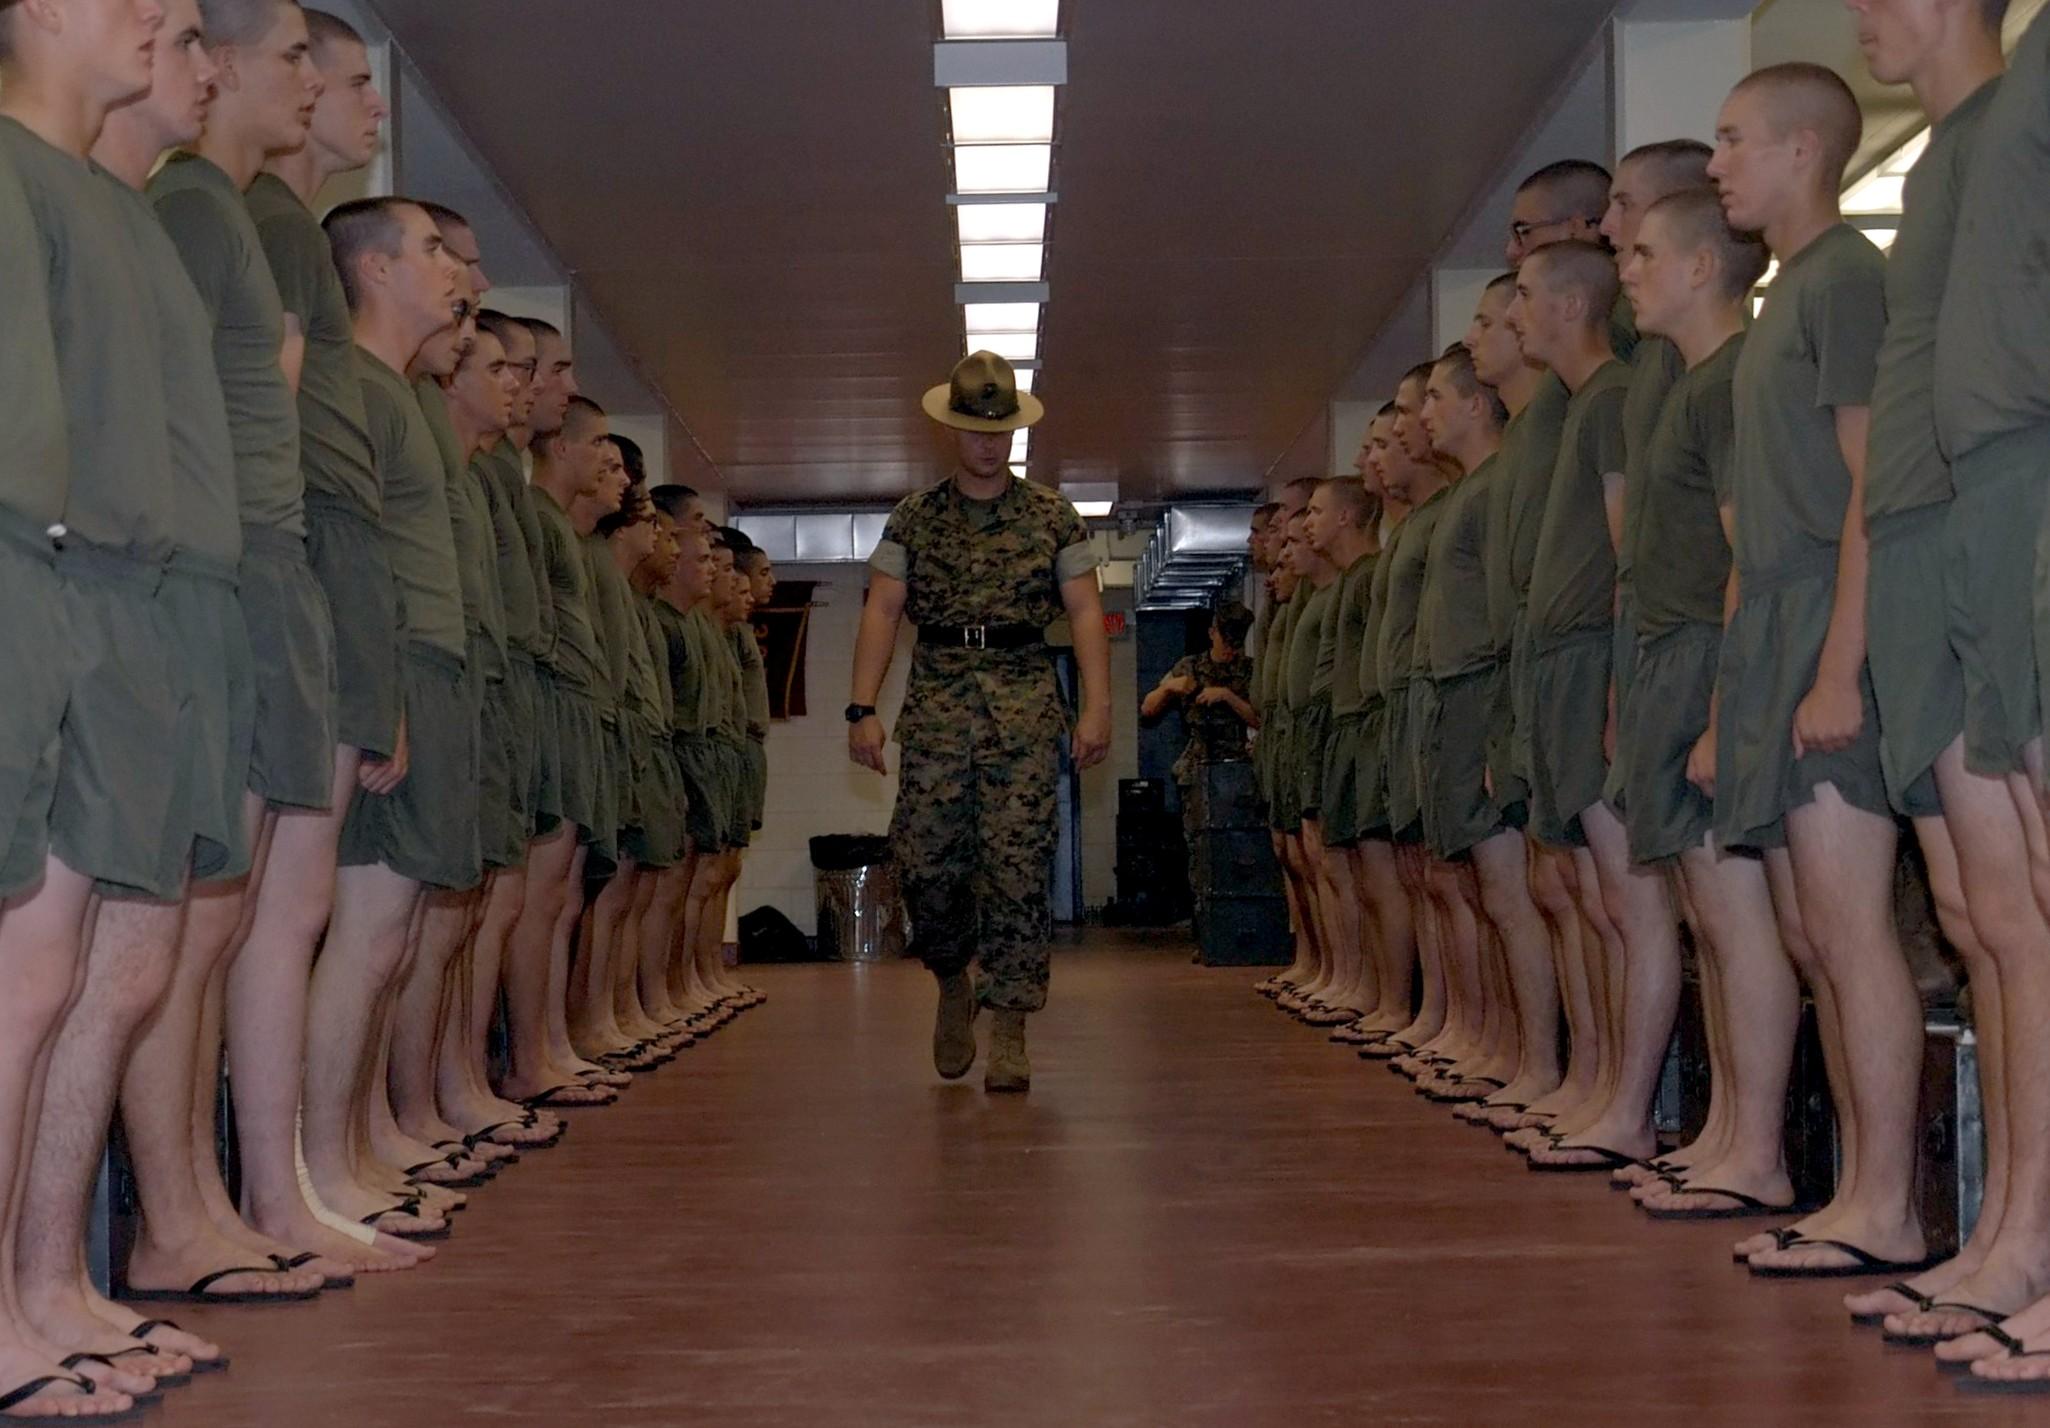 File:Marine Corps Platoon.jpg - Wikimedia Commons